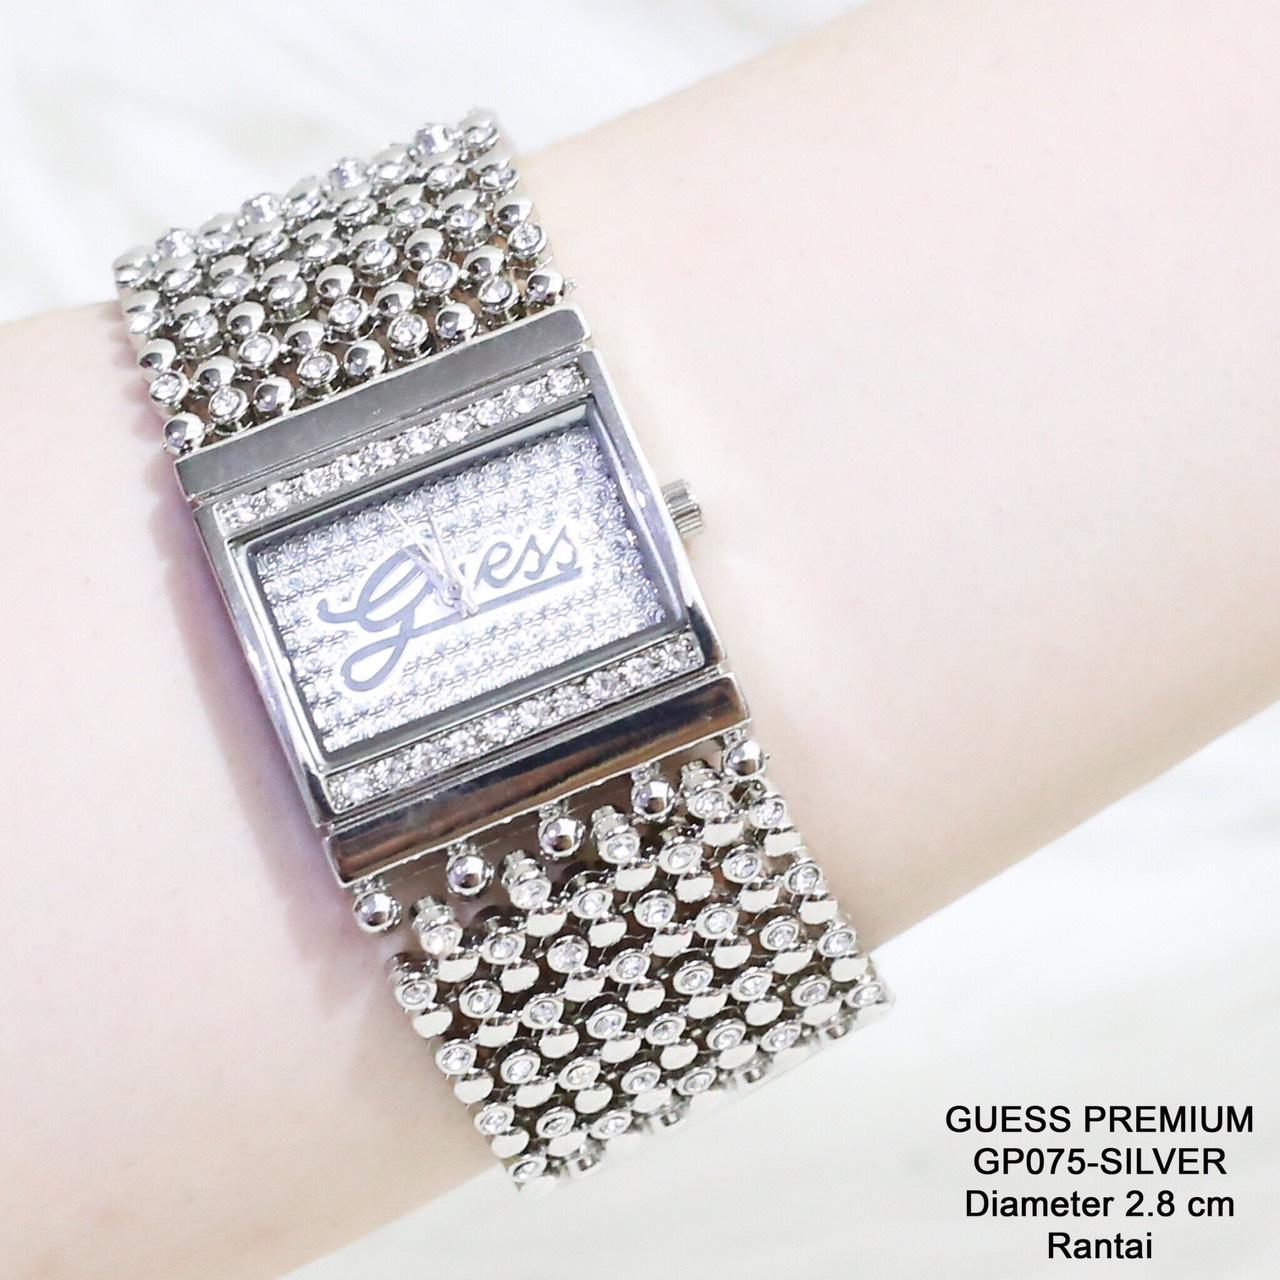 Jam tangan guess MERICA rantai permata diamond mote wanita grosir